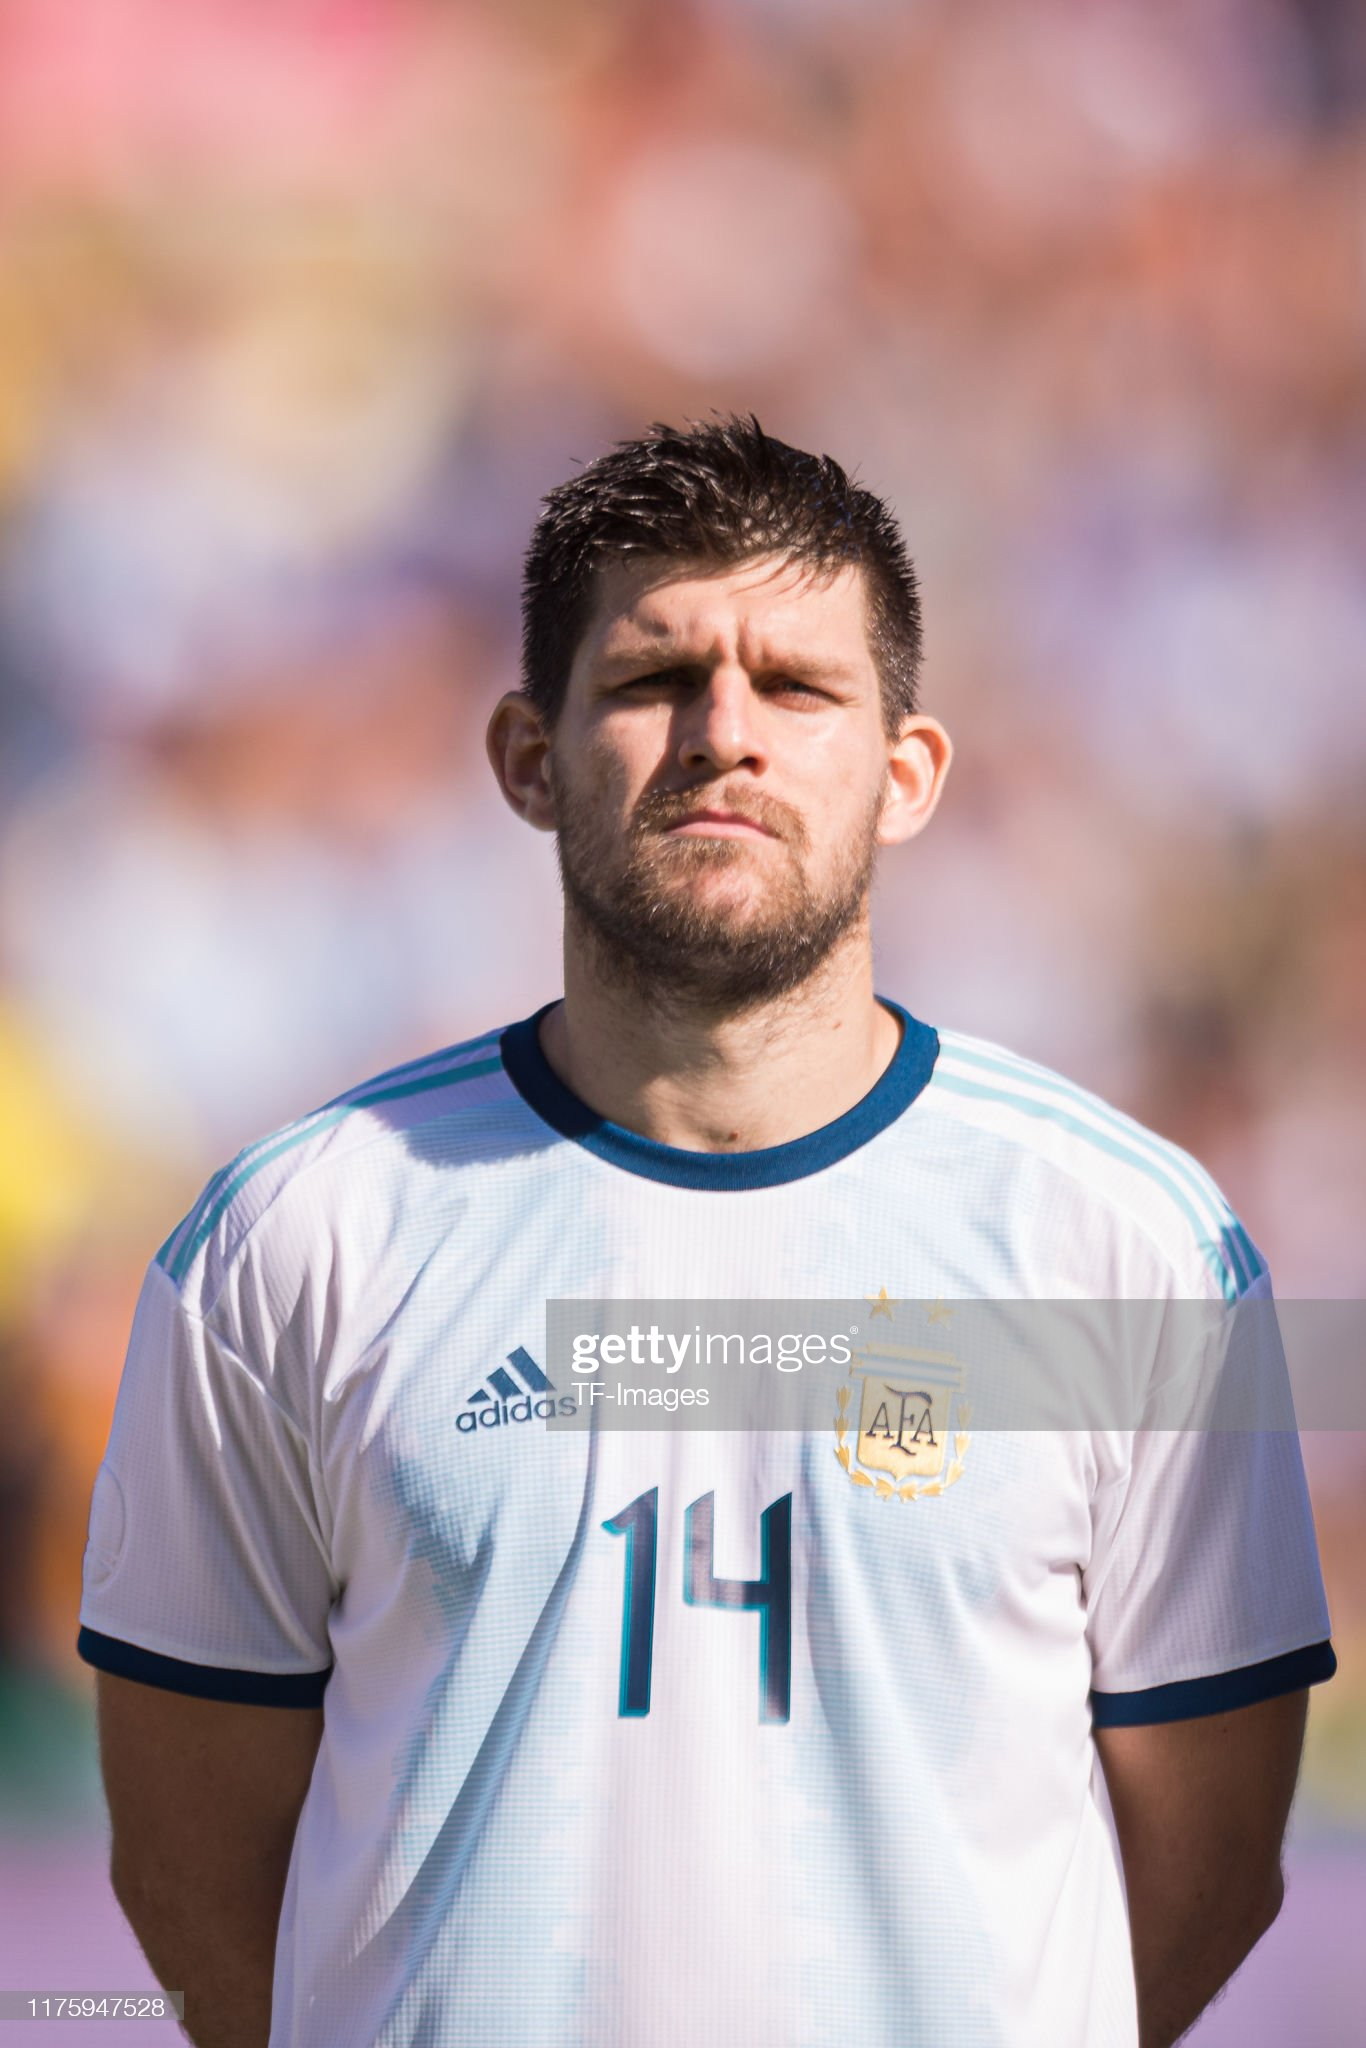 [Imagen: walter-kannemann-of-argentina-looks-on-d...=2048x2048]